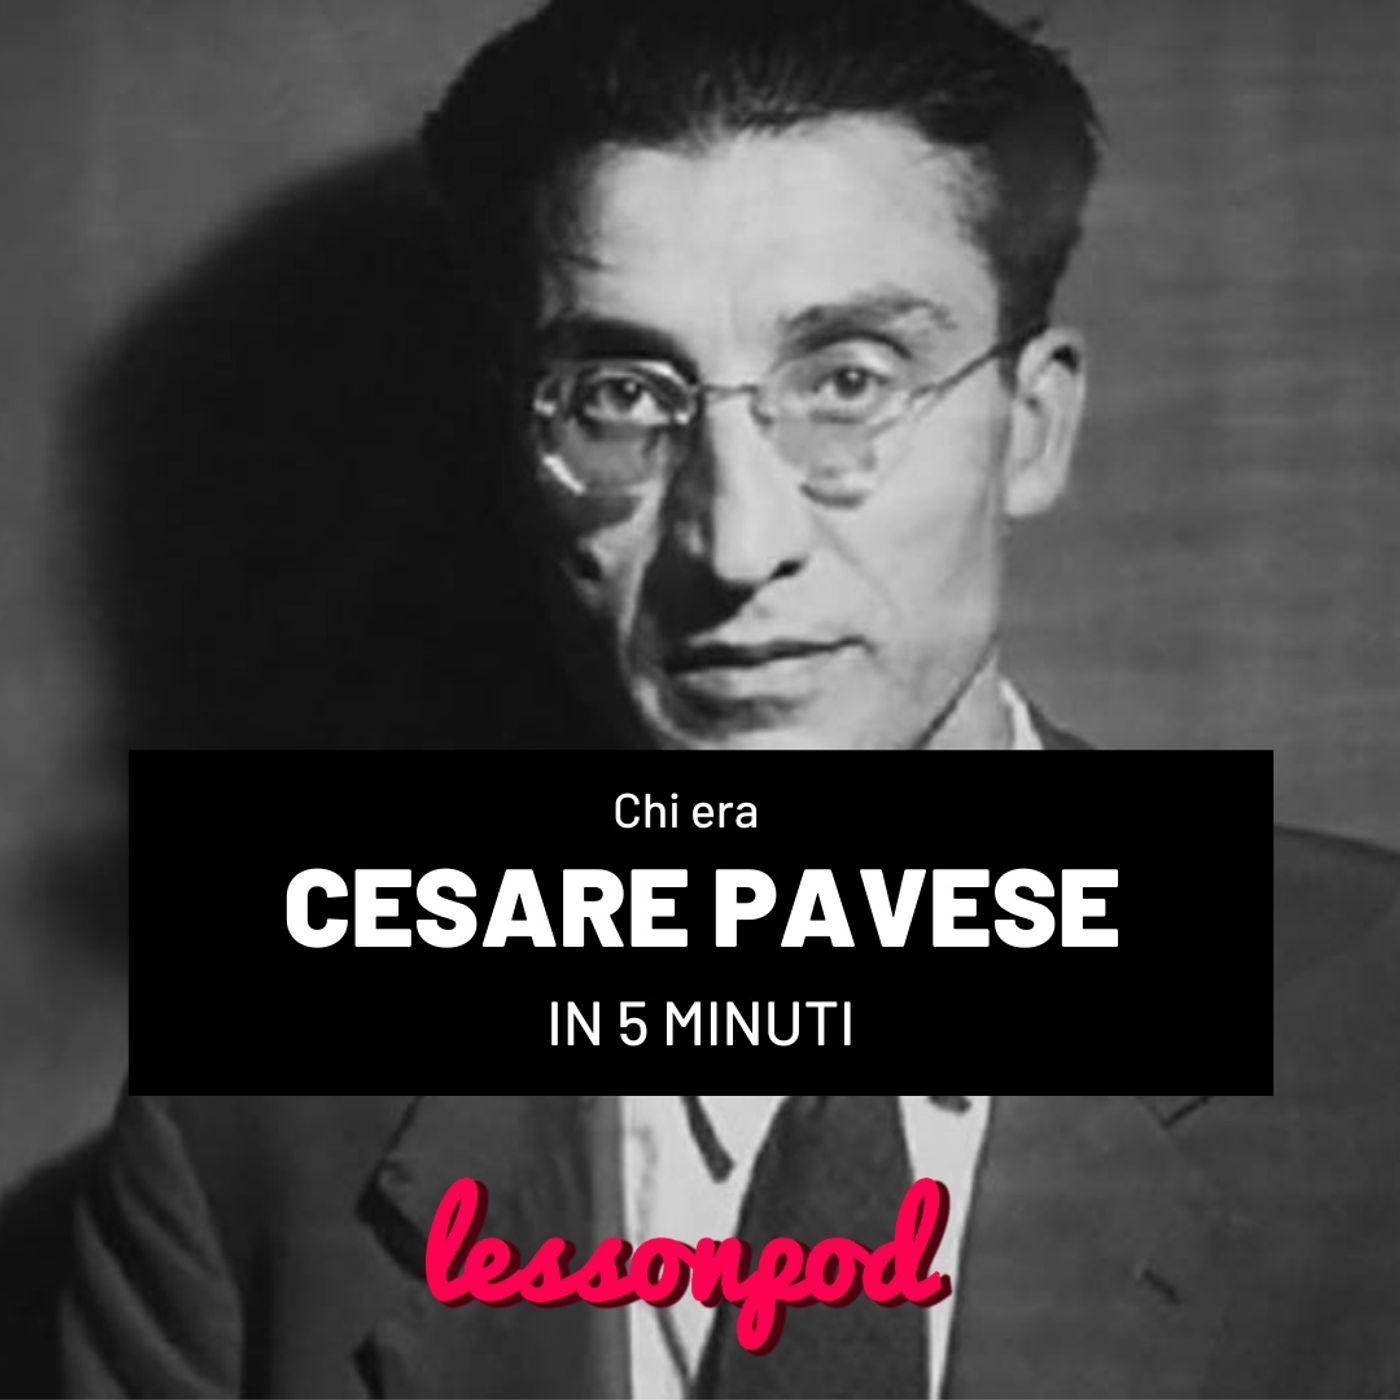 Chi era Cesare Pavese in 5 minuti